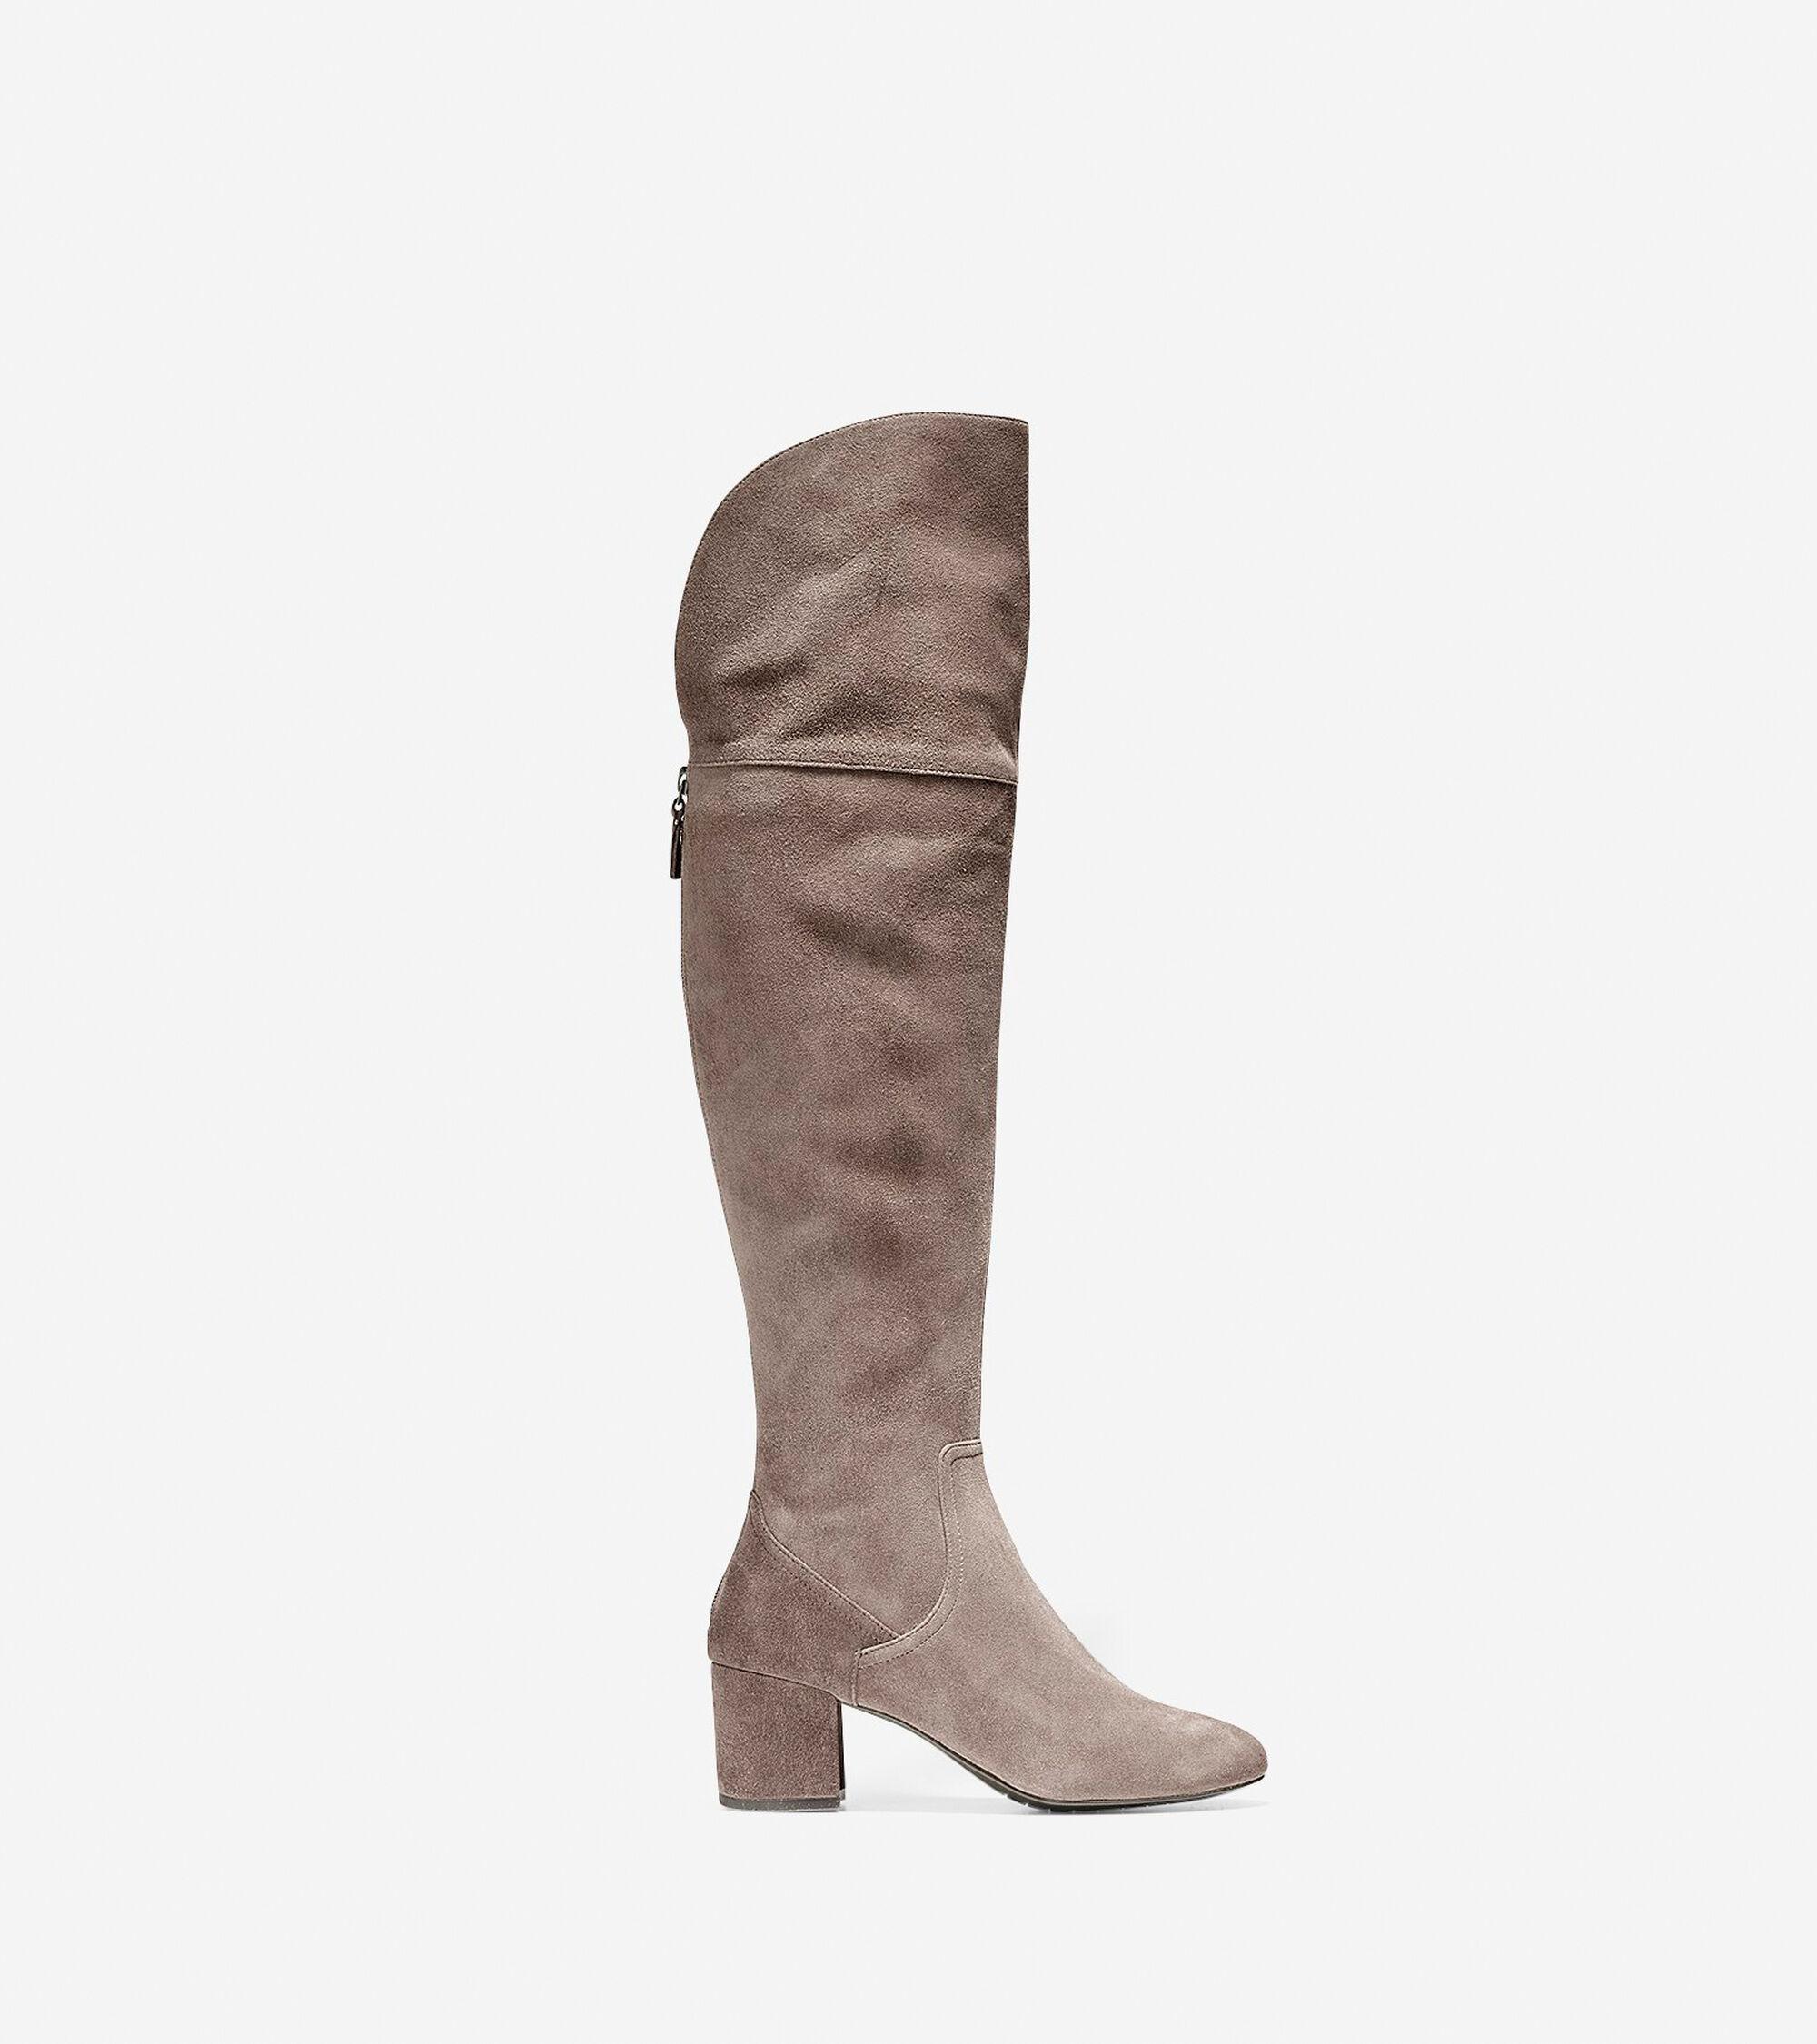 f9e68c44ed5 Women s Raina Grand Over The Knee Boots 55mm in Morel